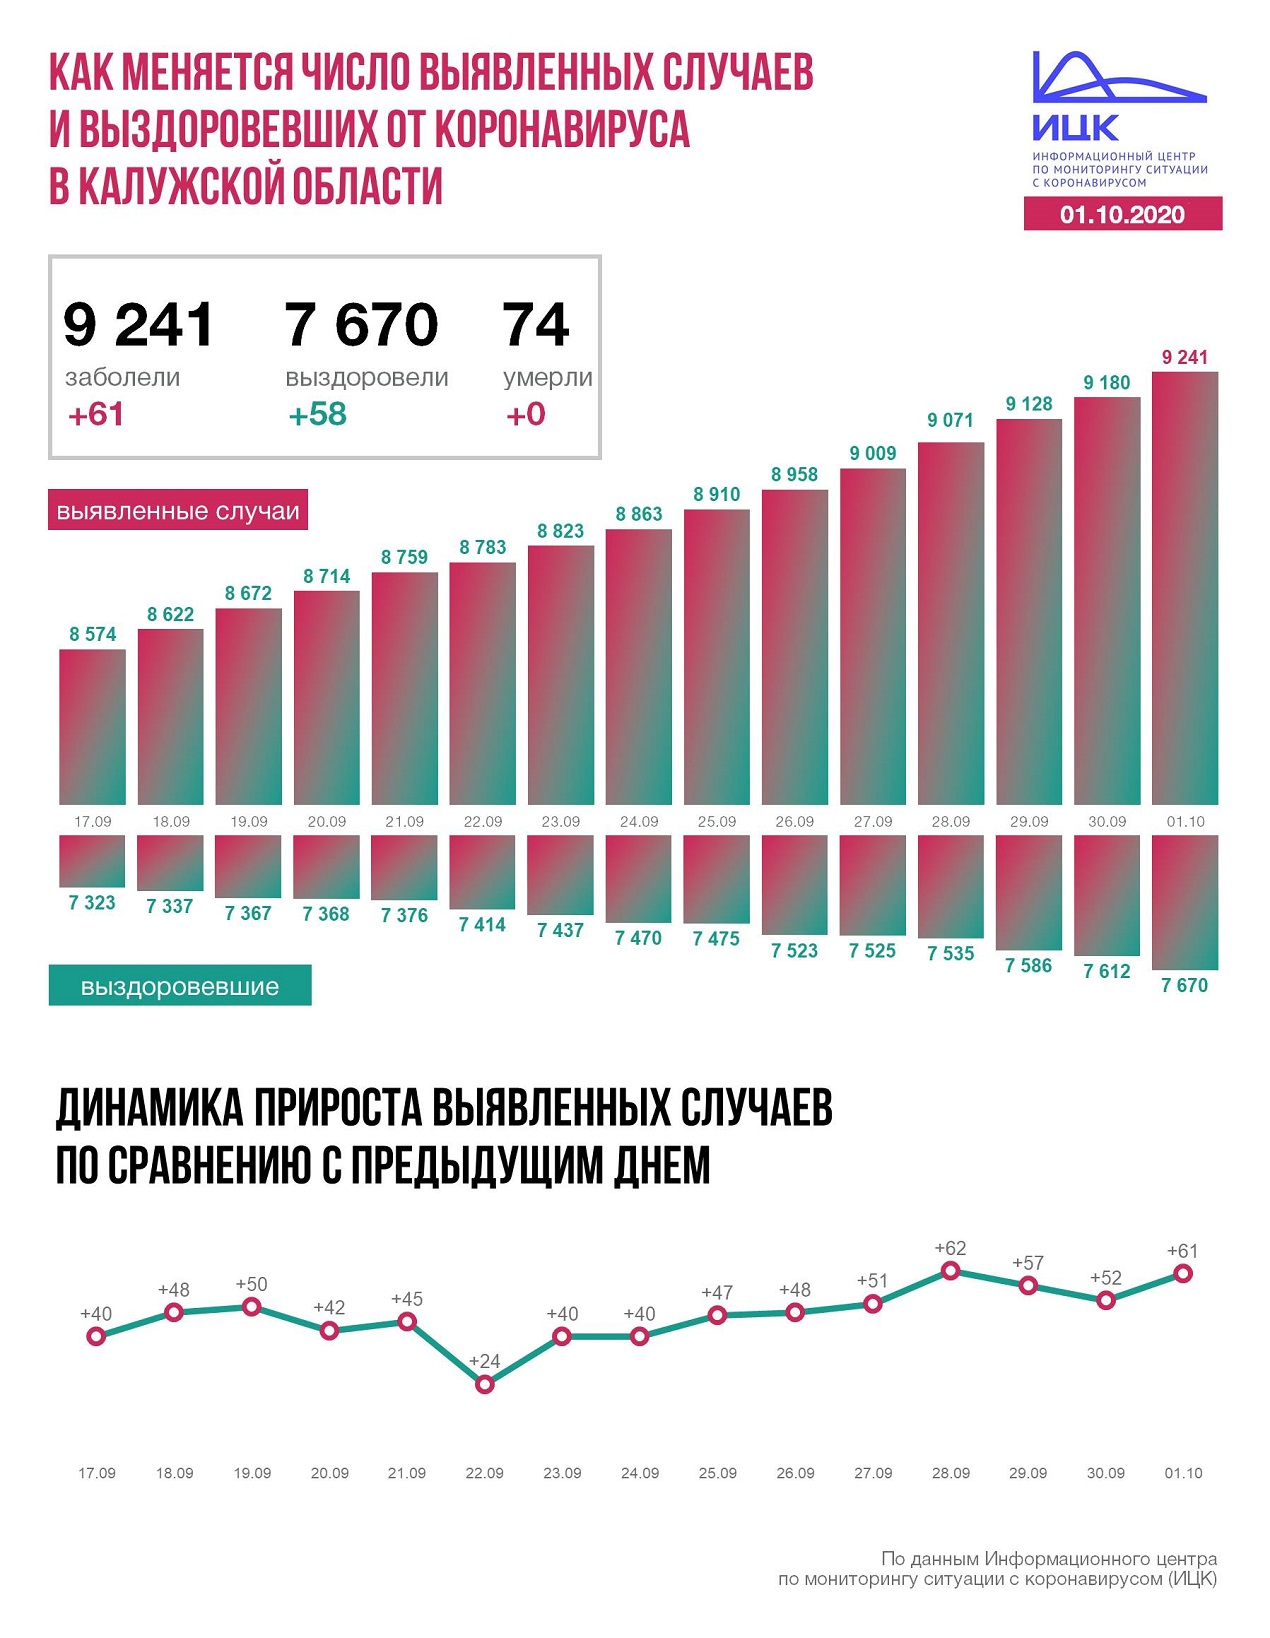 Калуга Калужская область коронавирус статистика 1 октября 2020 года